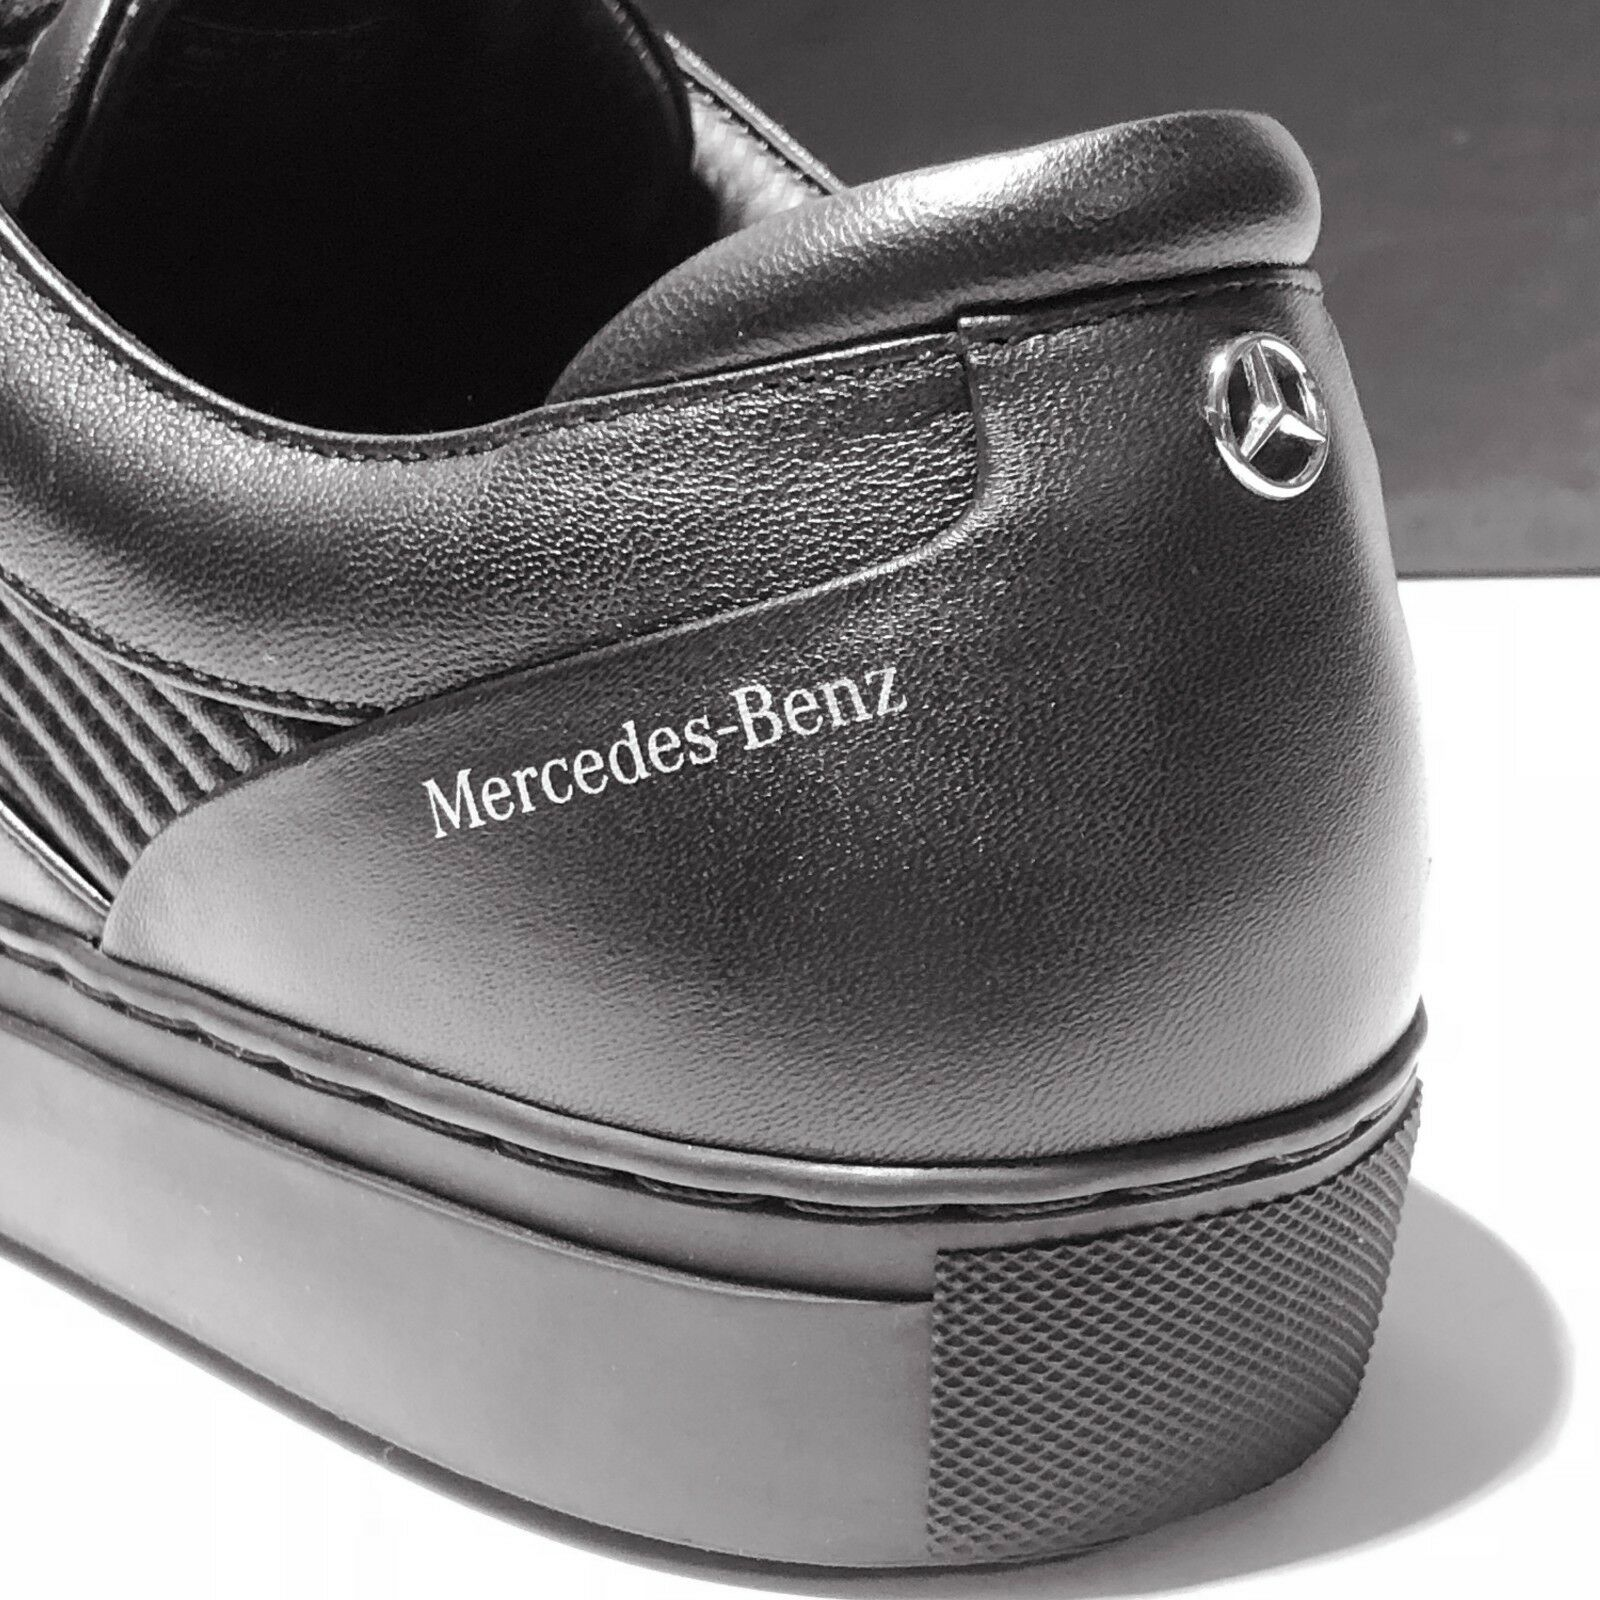 HUGO BOSS Mercedes Benz Black Textured